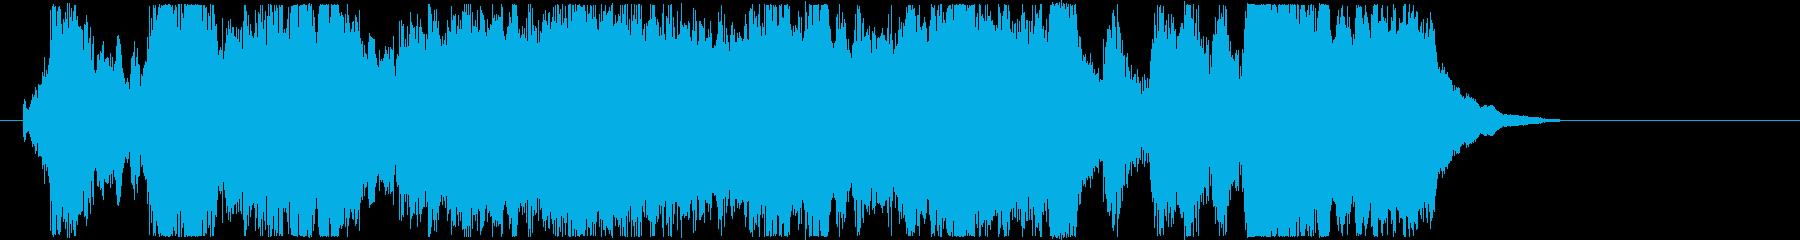 CM15秒 先進希望未来 オーケストラの再生済みの波形